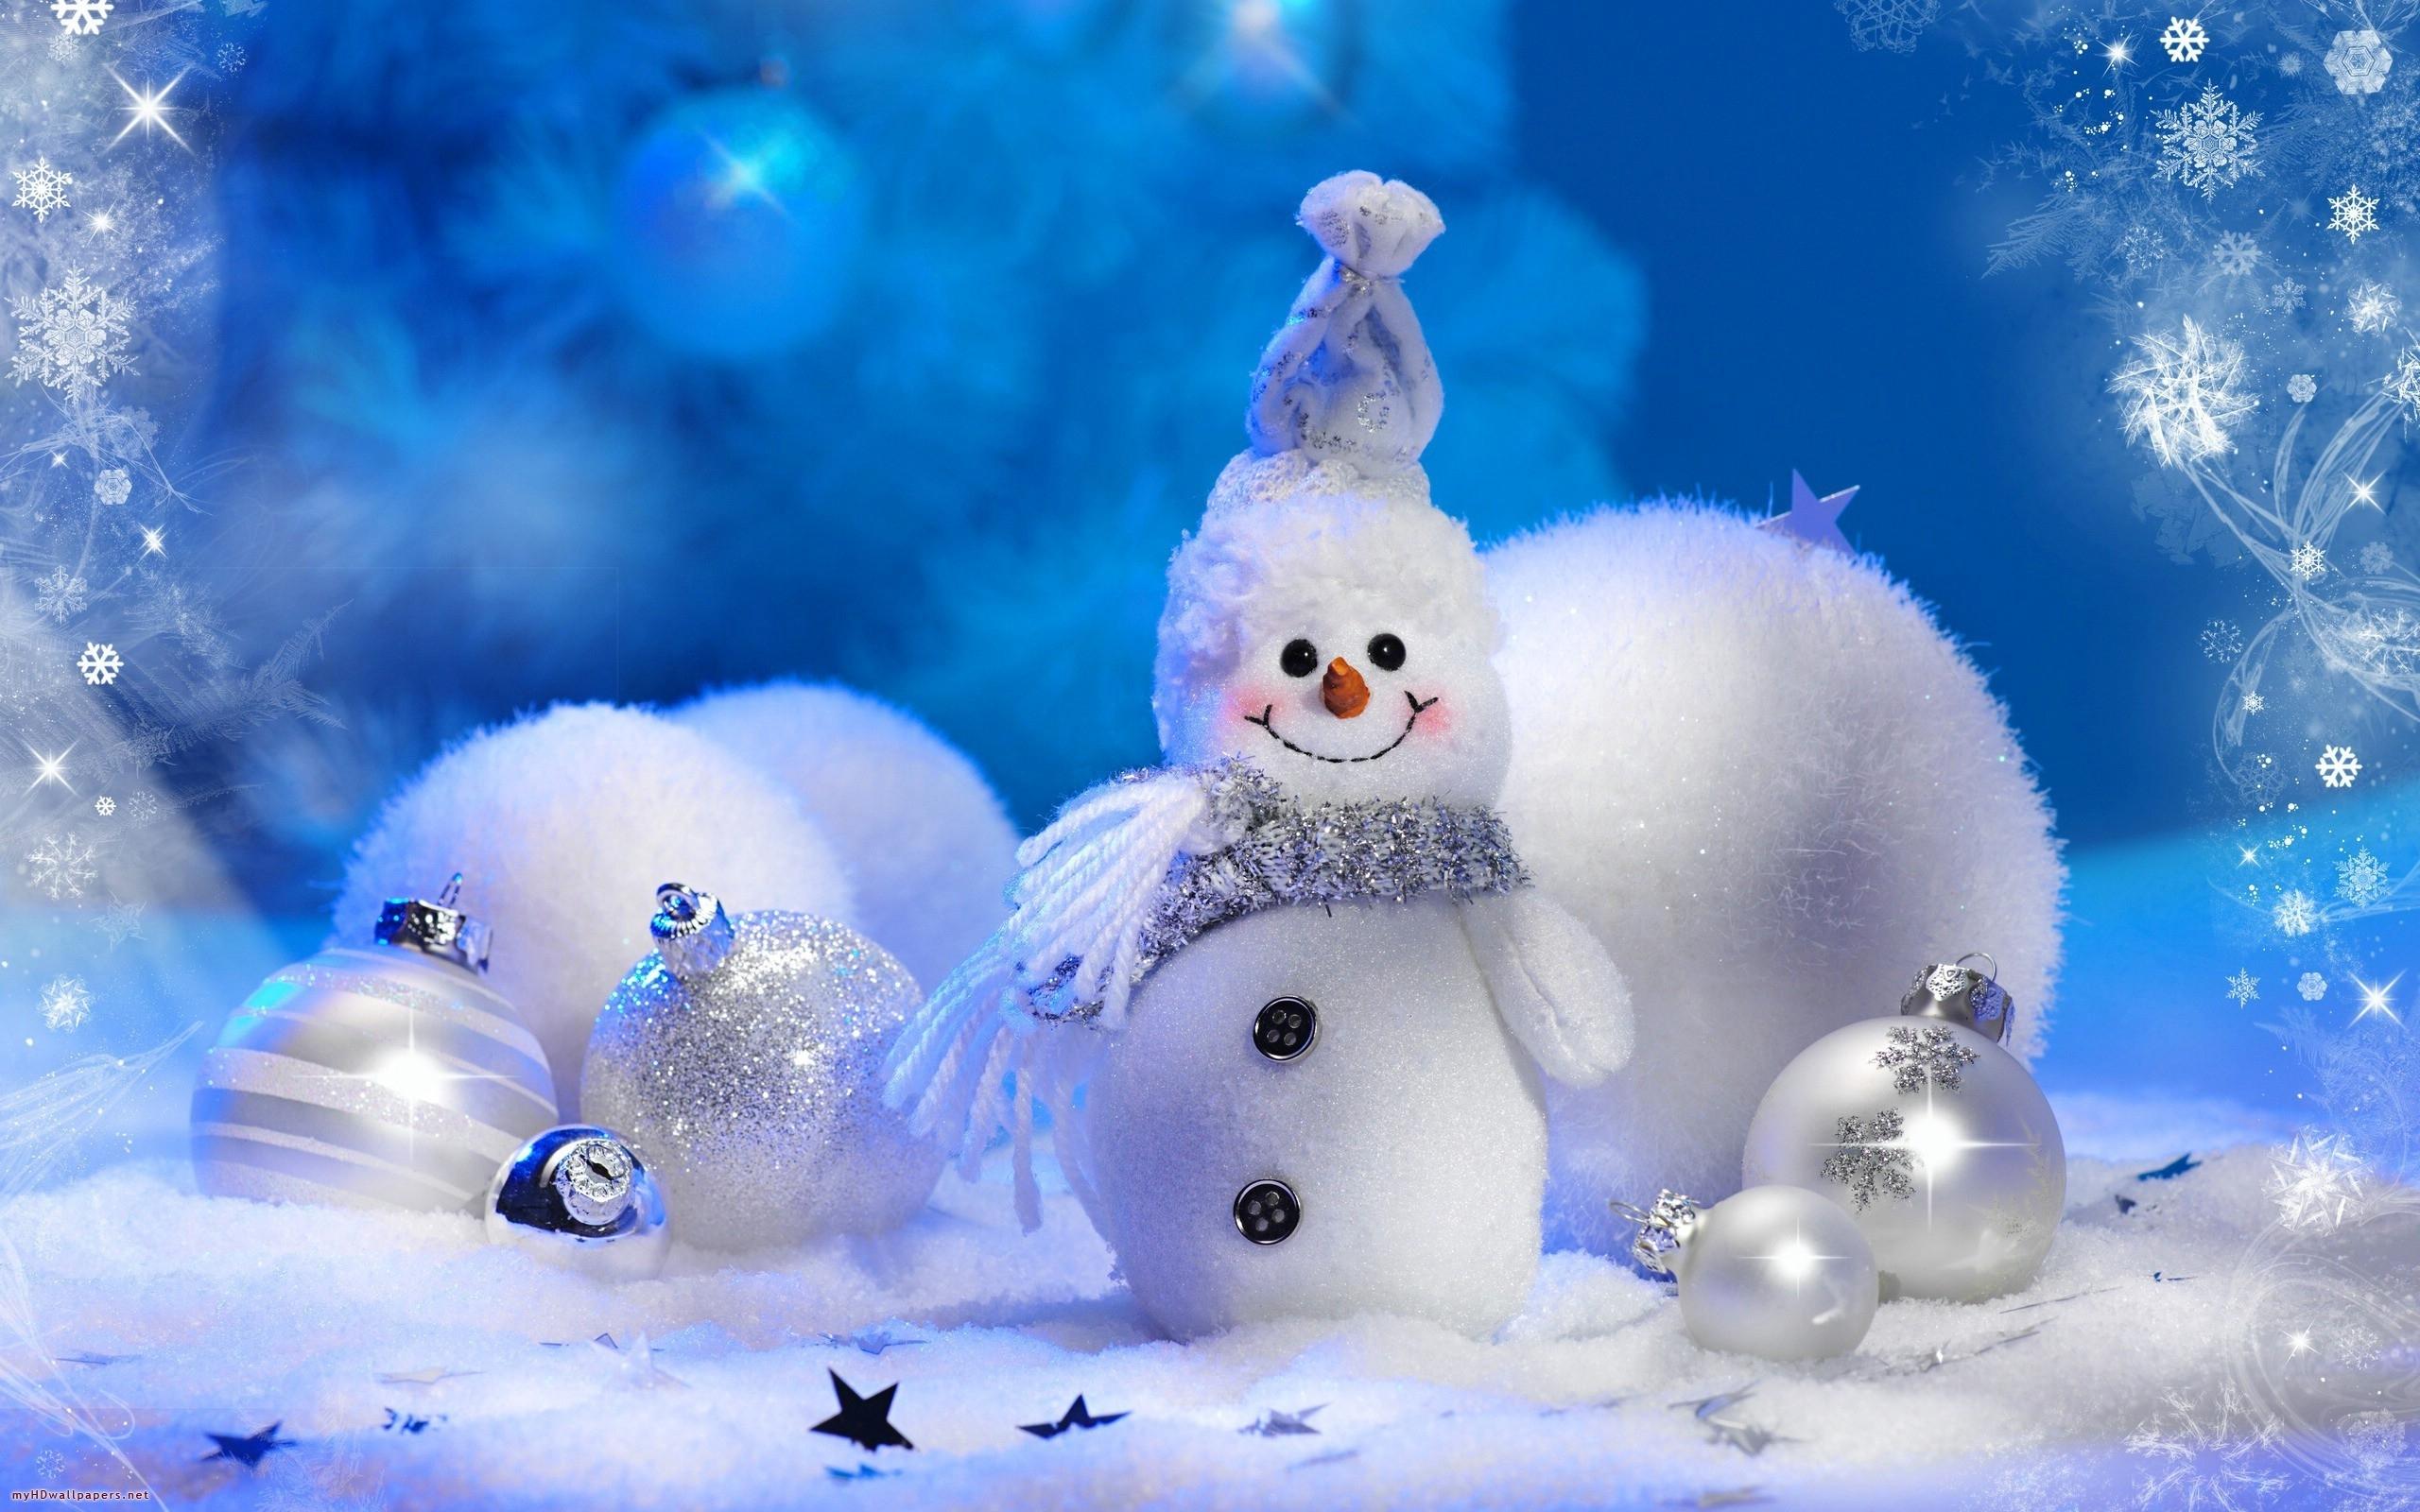 snowman-backgrounds - wallpaper.wiki